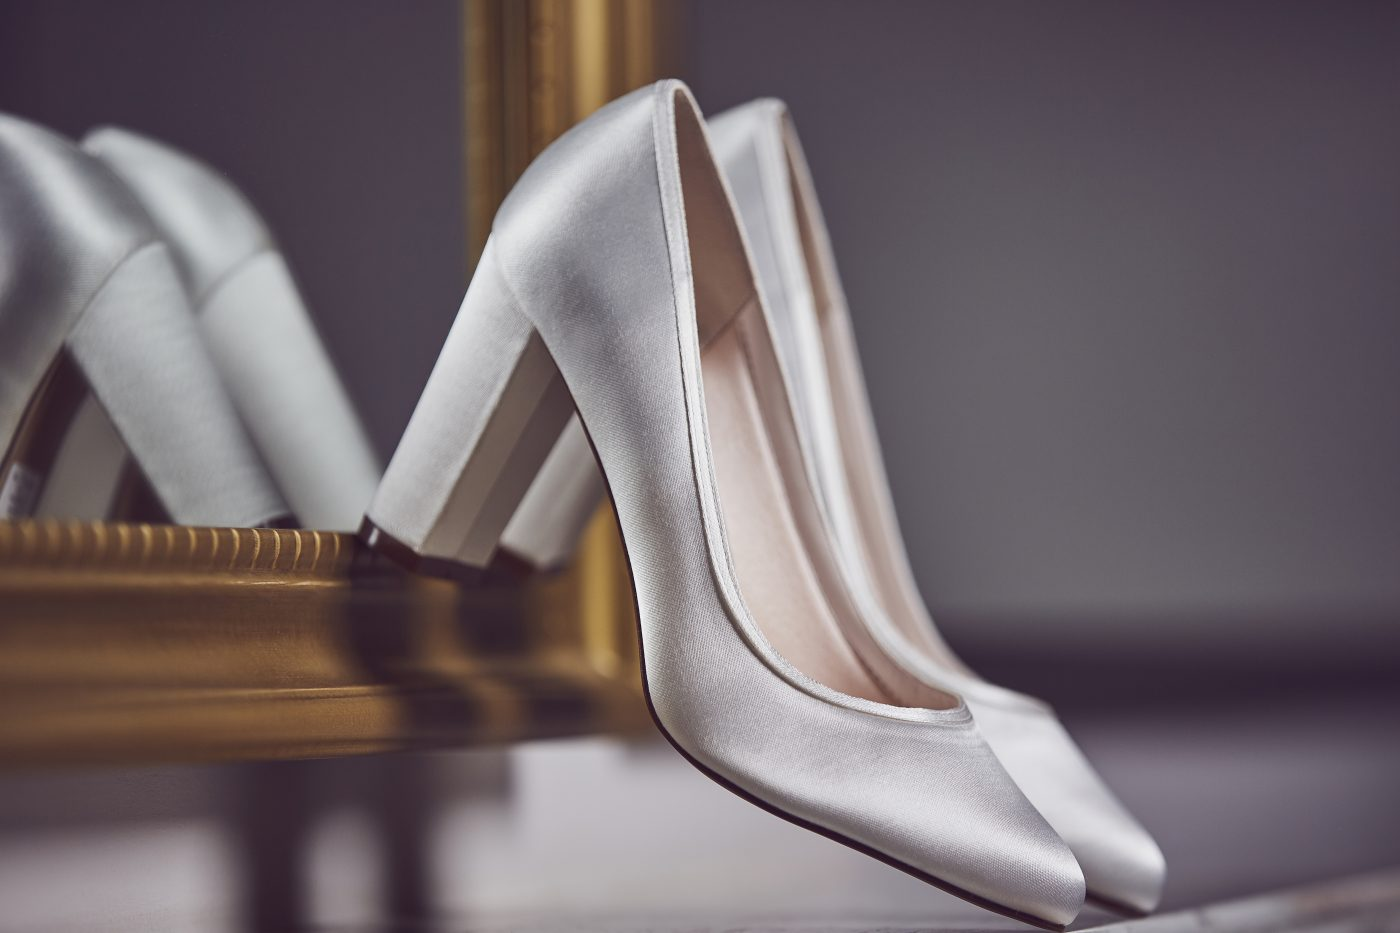 "<a href=""https://www.rainbowclub.co.uk/keily-simple-ivory-satin-wedding-shoes"" target=""_blank"" rel=""noopener noreferrer"">Keily Block Heel by Rainbow Club</a> £85"